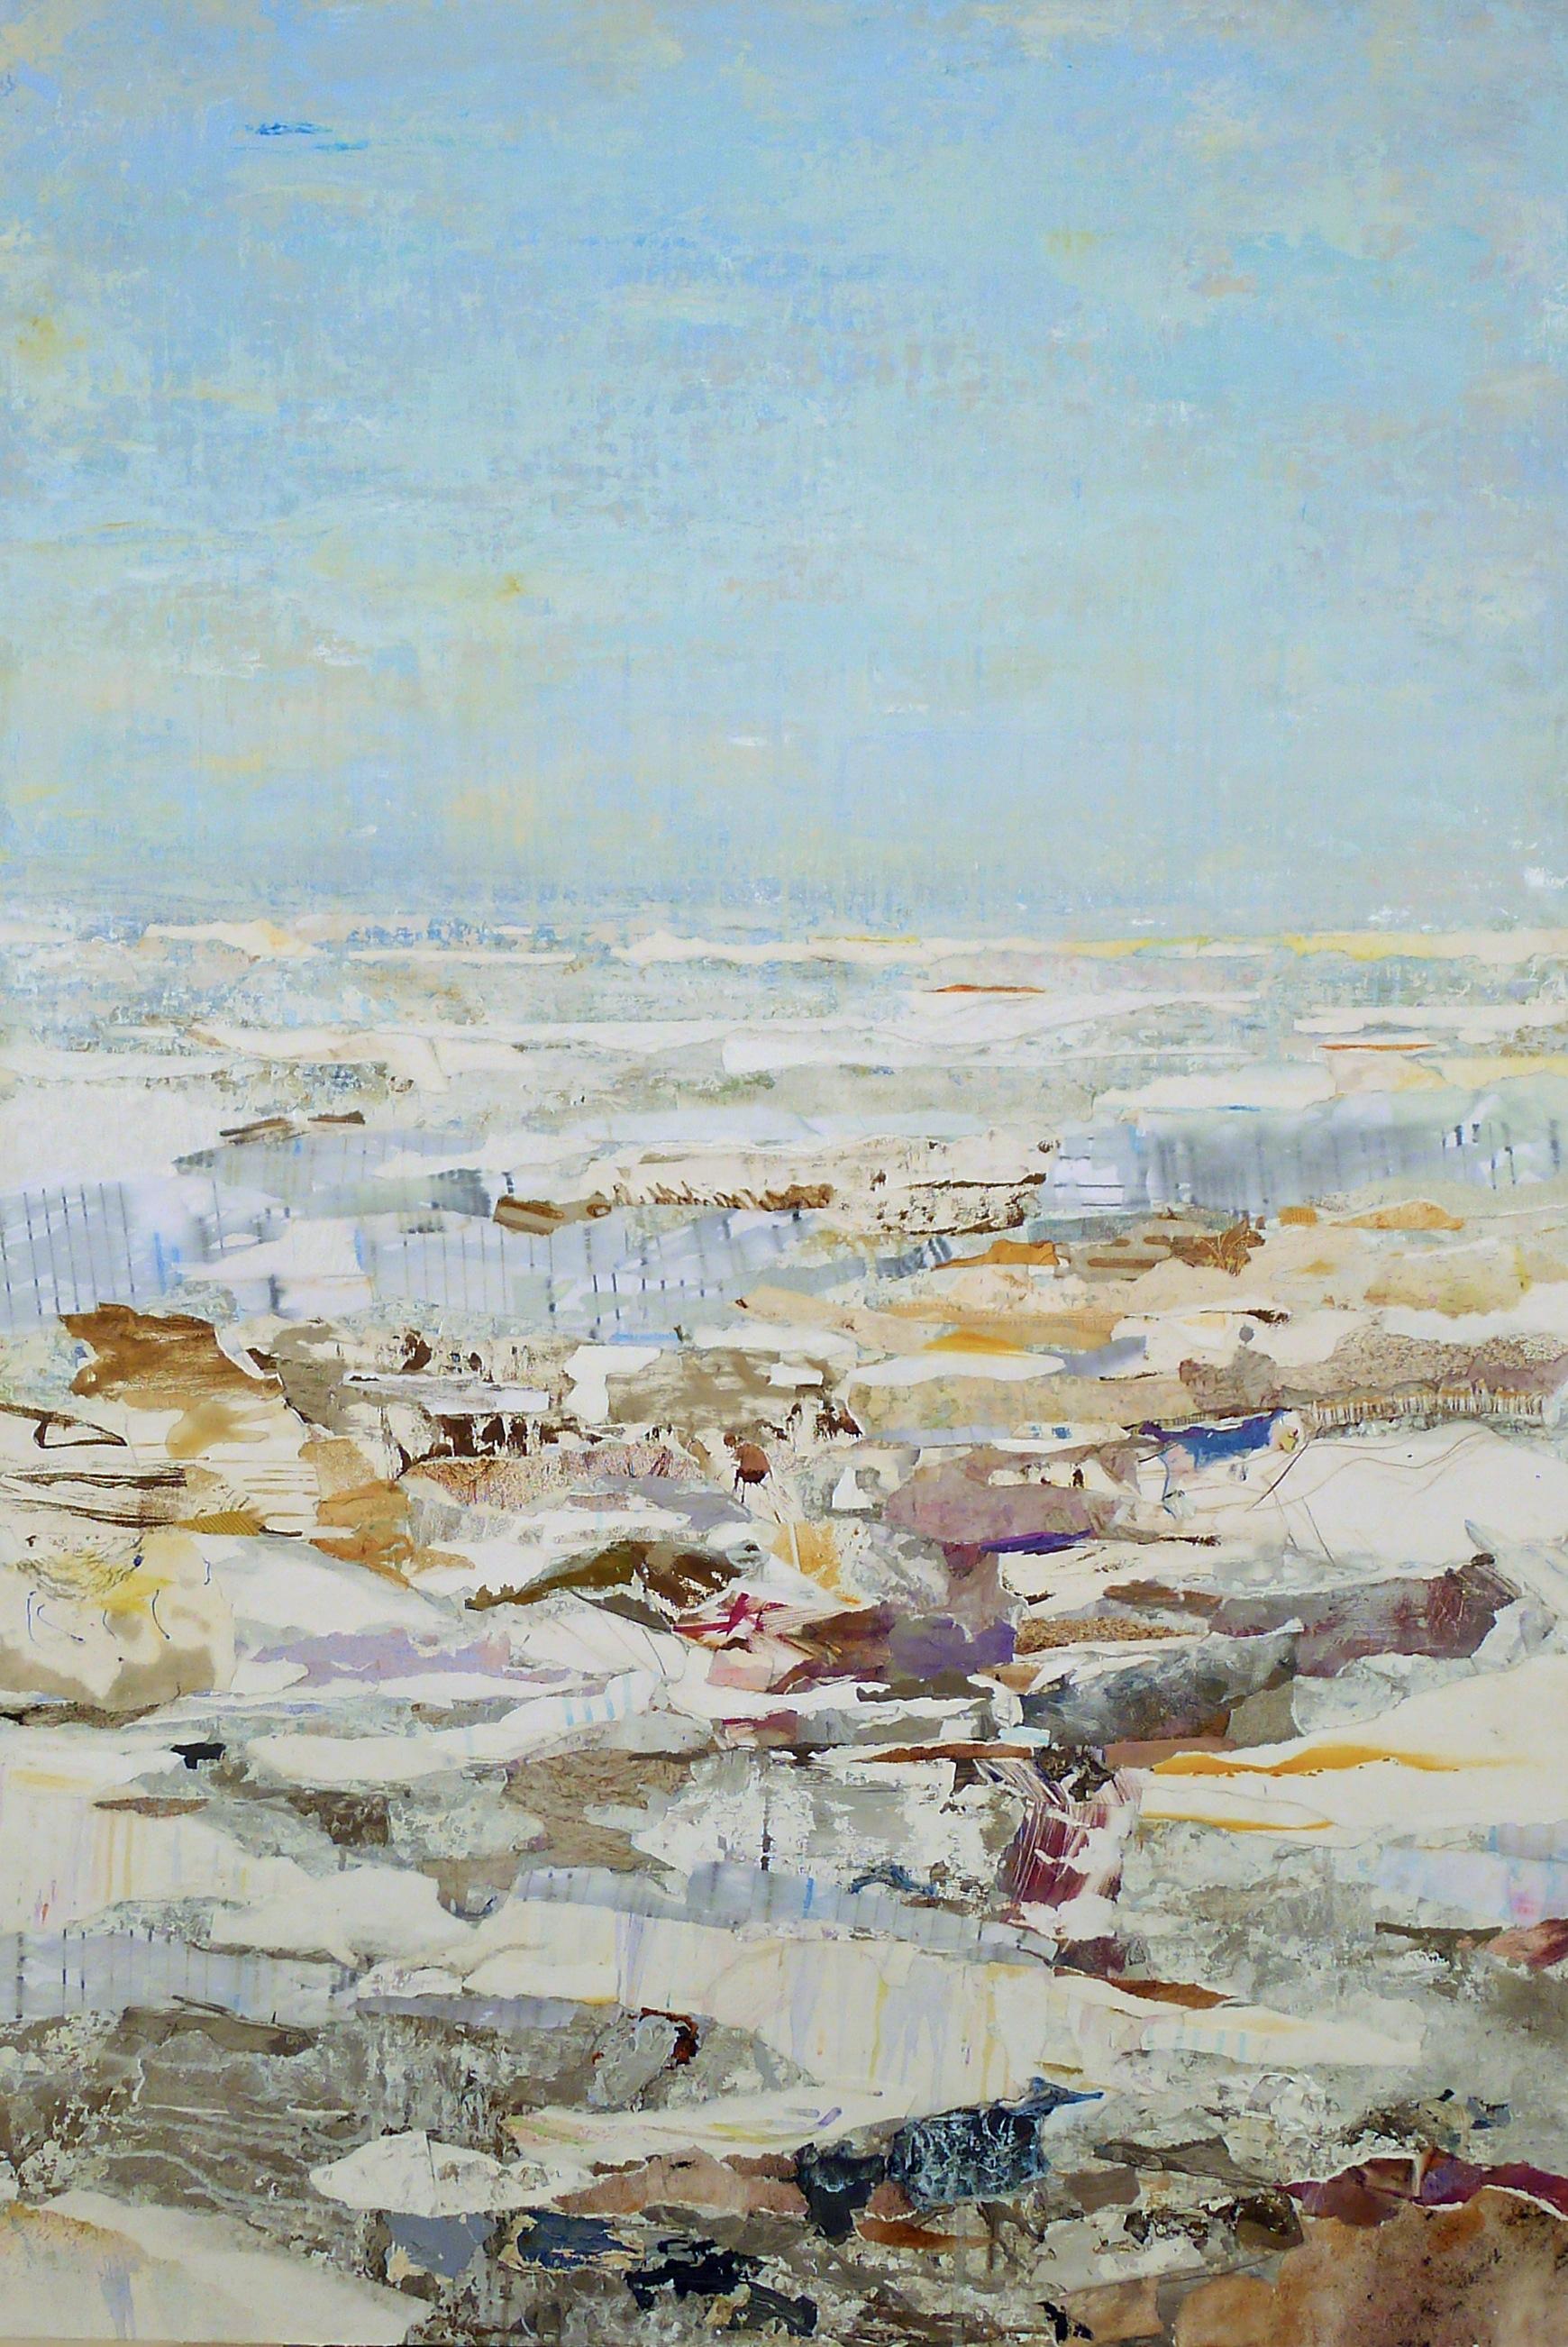 Brenda Cirioni,Passage, mixed media, 48x32, $3,200